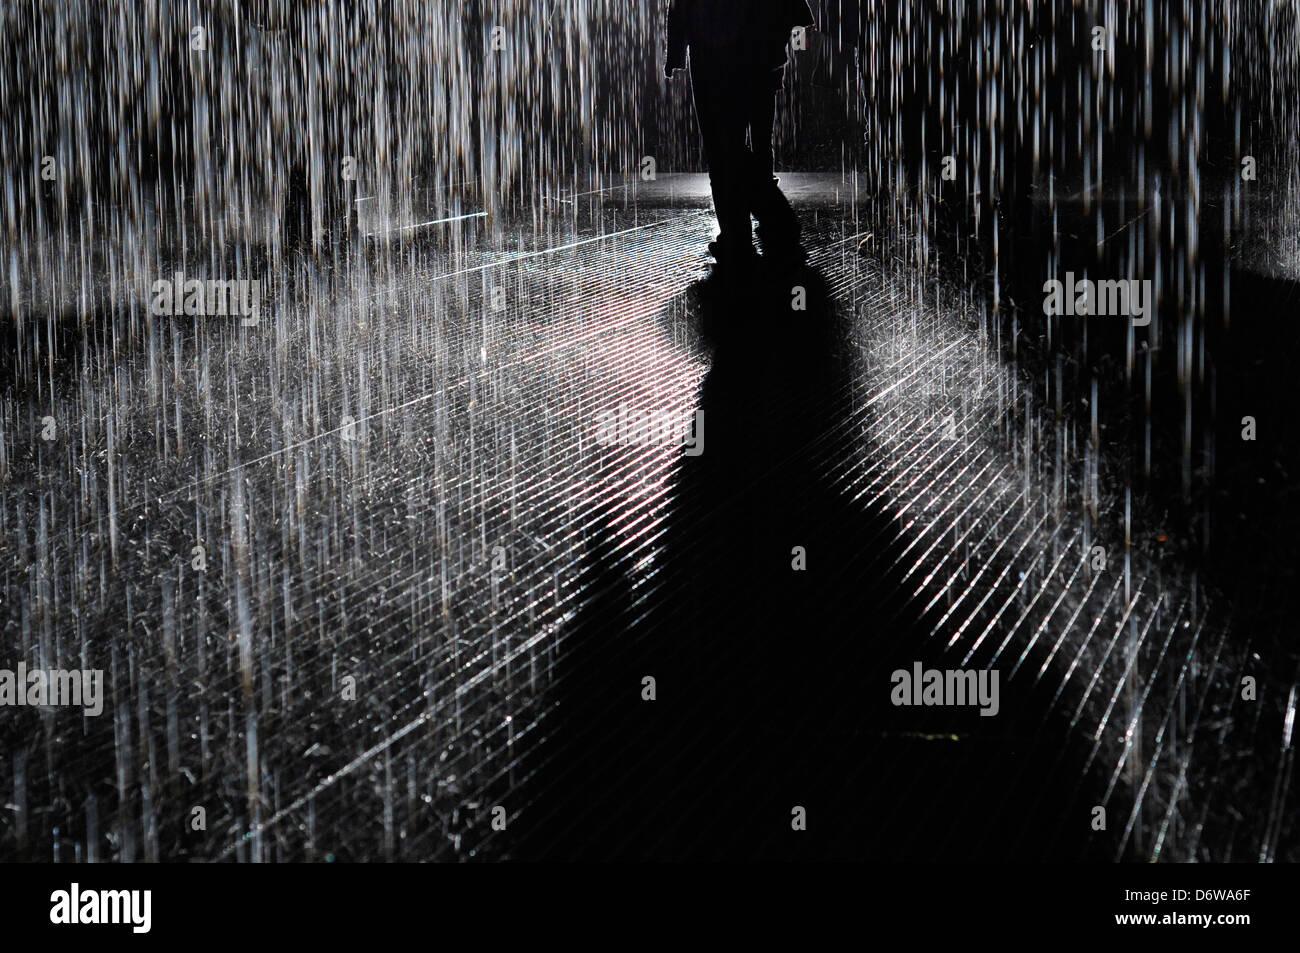 Man In The Rain 109